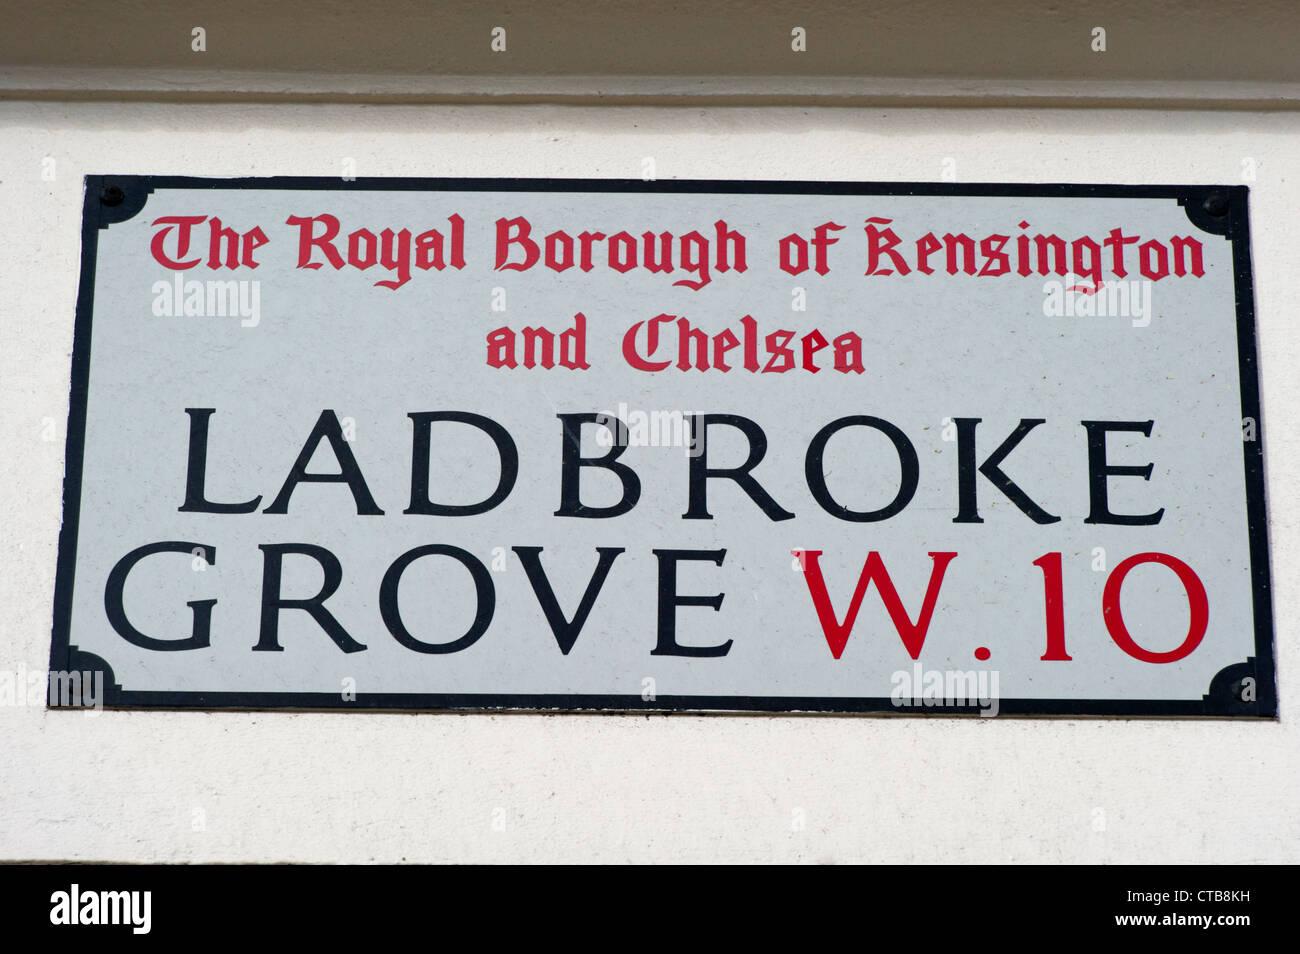 Ladbroke Grove, W.10 street sign Stock Photo